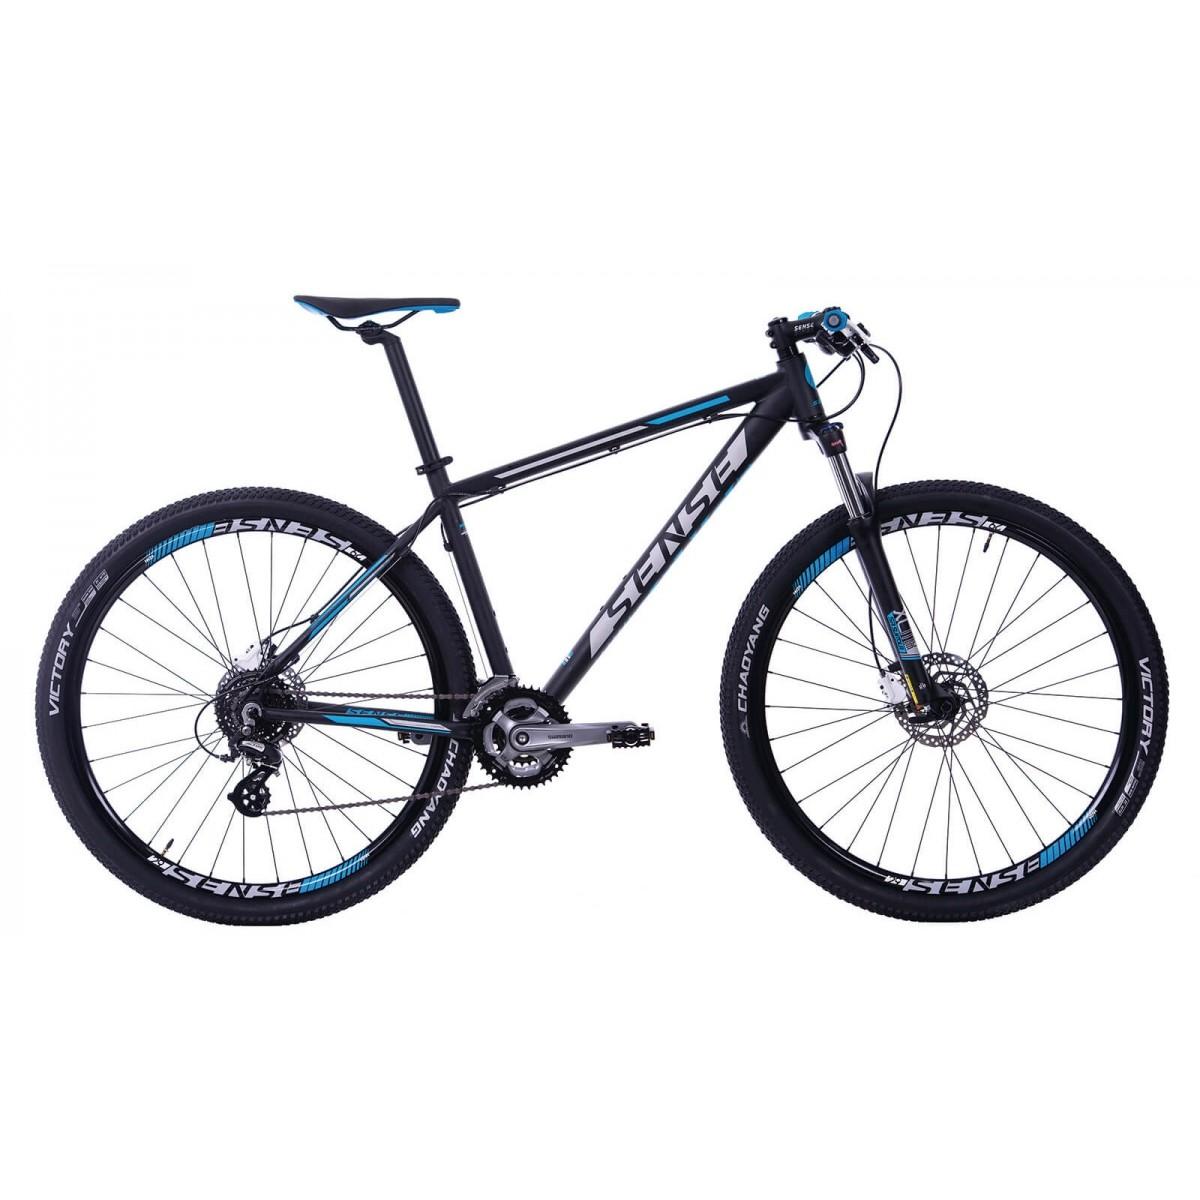 Bicicleta Mtb Sense Rock Shimano Altus Aro 29 24v